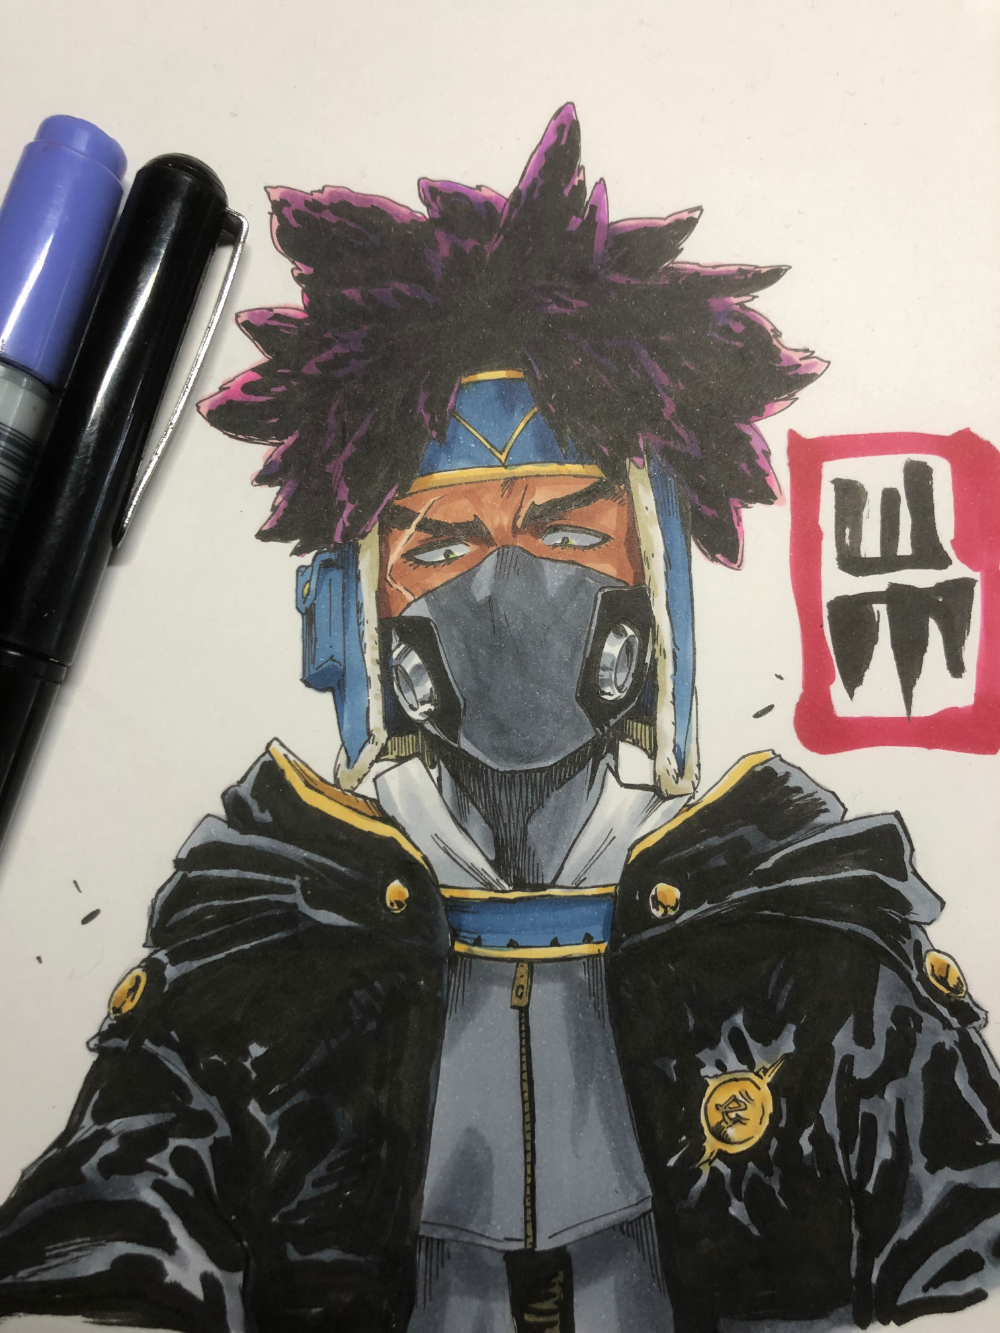 Pin by Gladys Clervoix on stuff in 2020 Manga artist